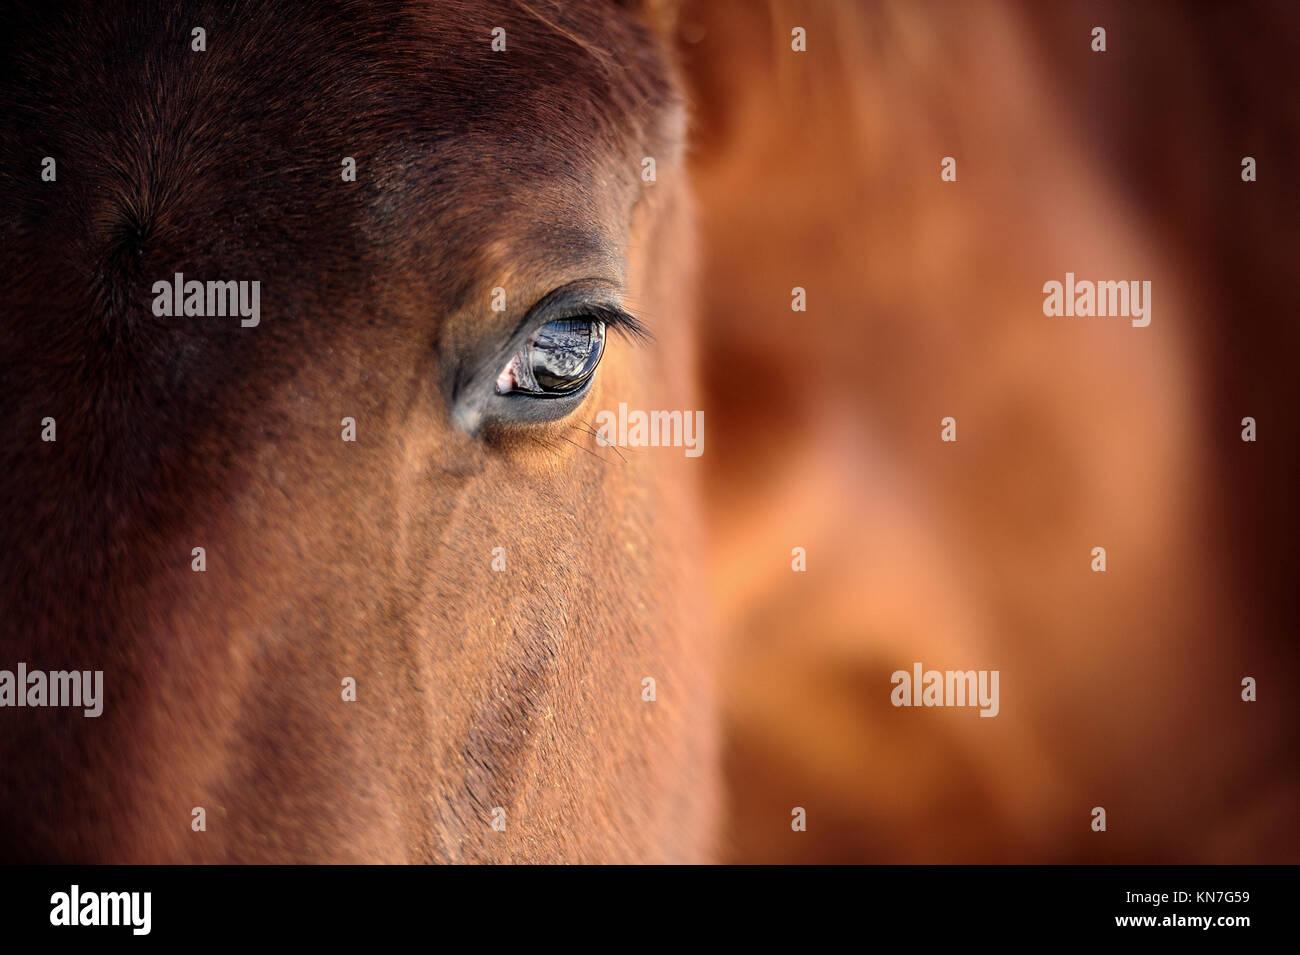 Eye of Arabian bay horse - Stock Image